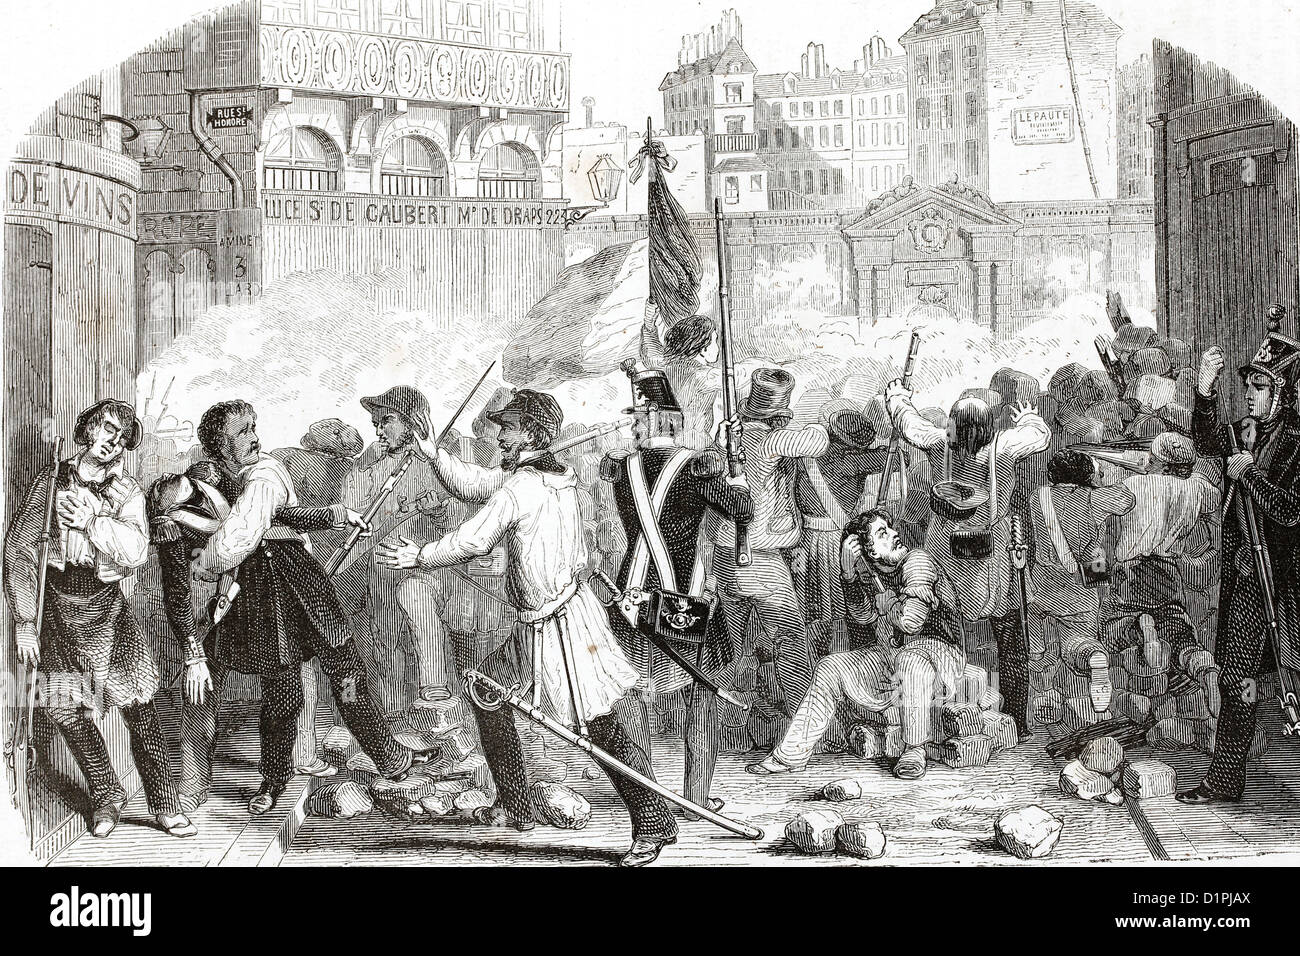 French revolution (July 1830). Antique illustration, 1855. - Stock Image